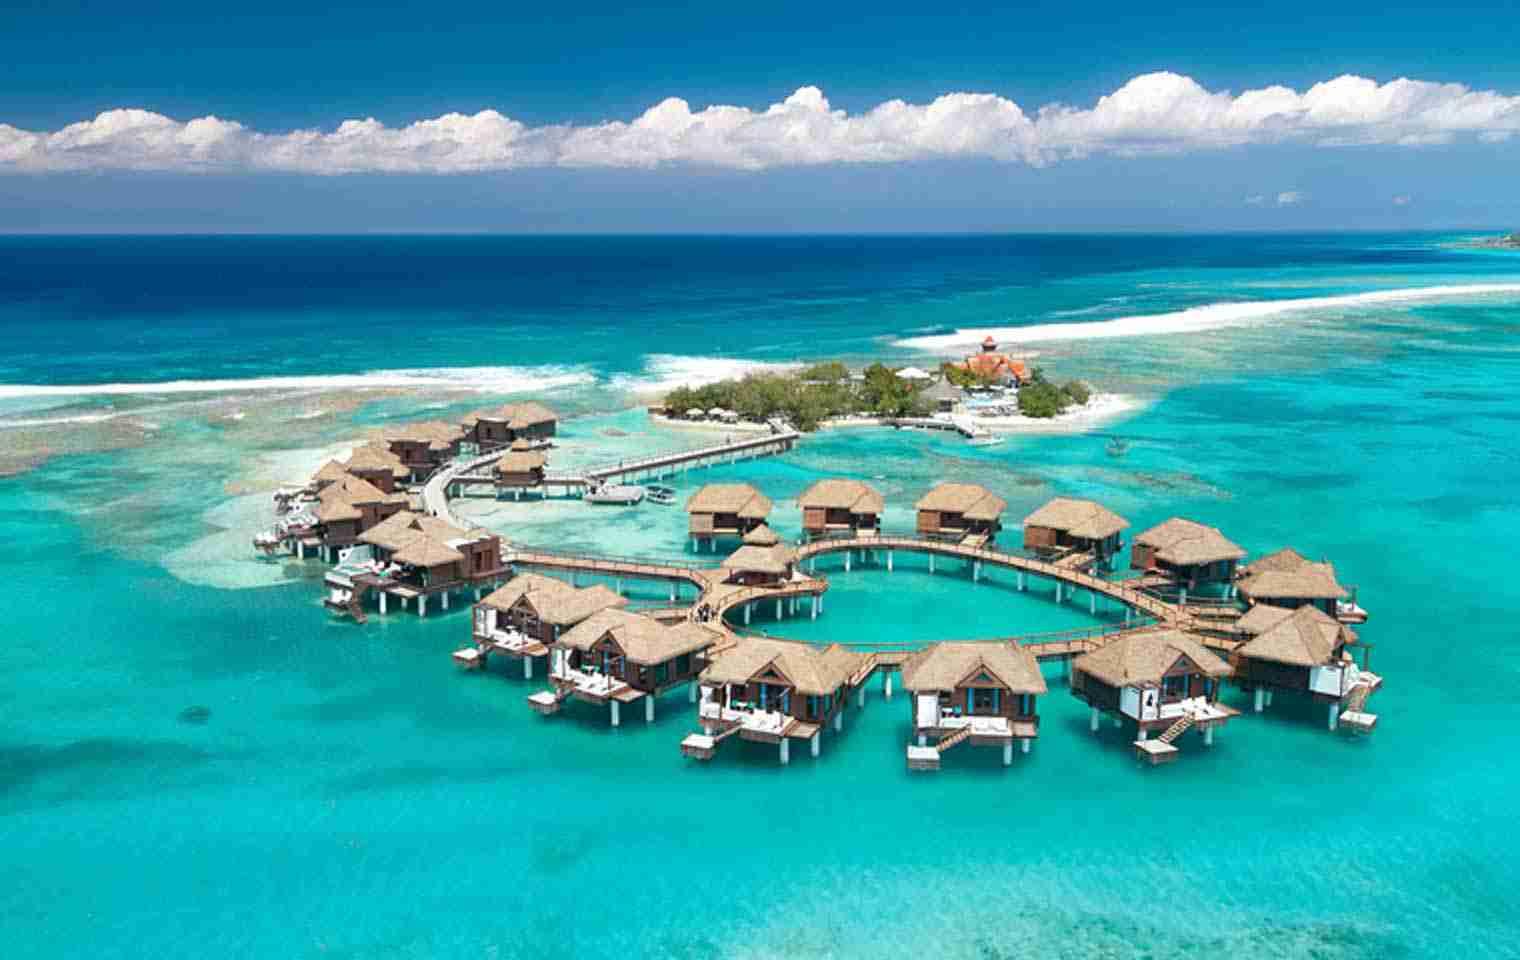 5 Best Caribbean Cruises 2018: Cruises to the Caribbean on Cruise ...